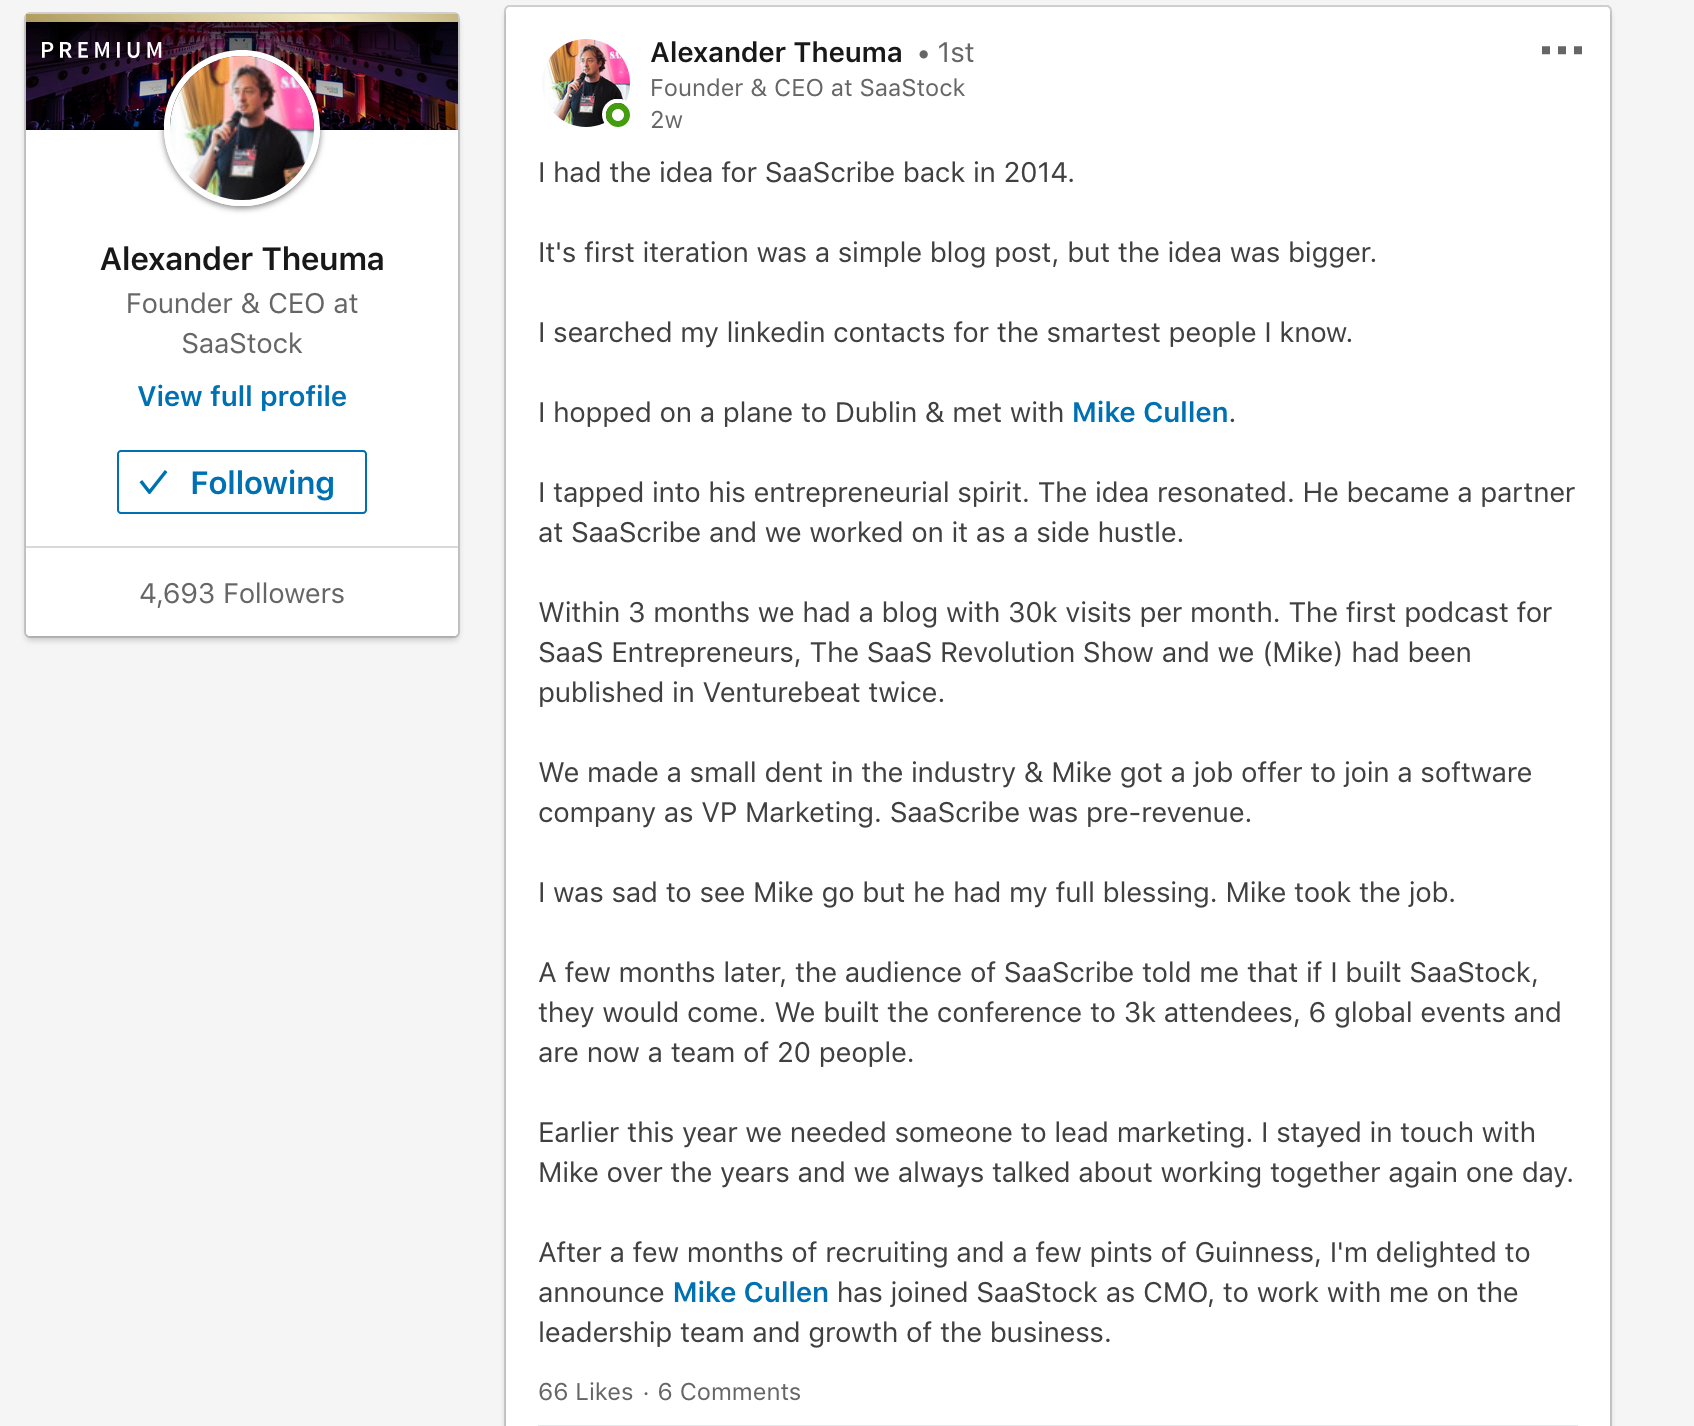 Content Writing on LinkedIn - Alexander Theuma - SaaStock